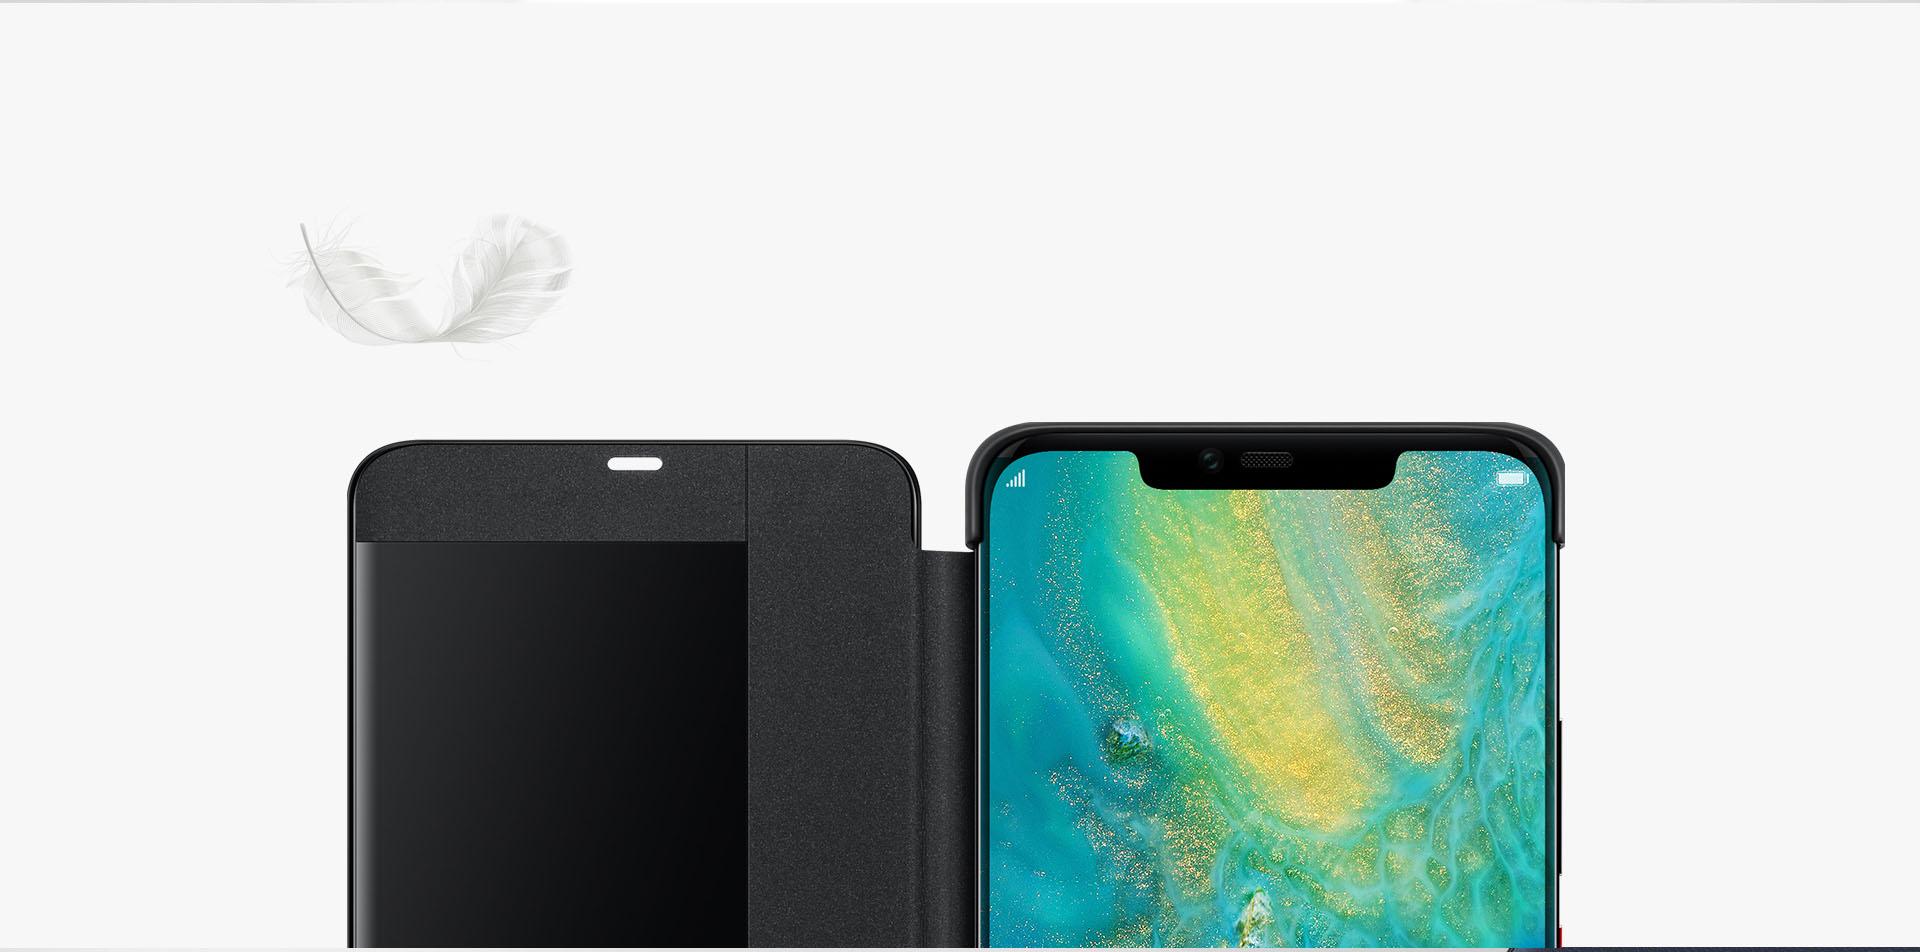 Huawei Mate 20 Pro case